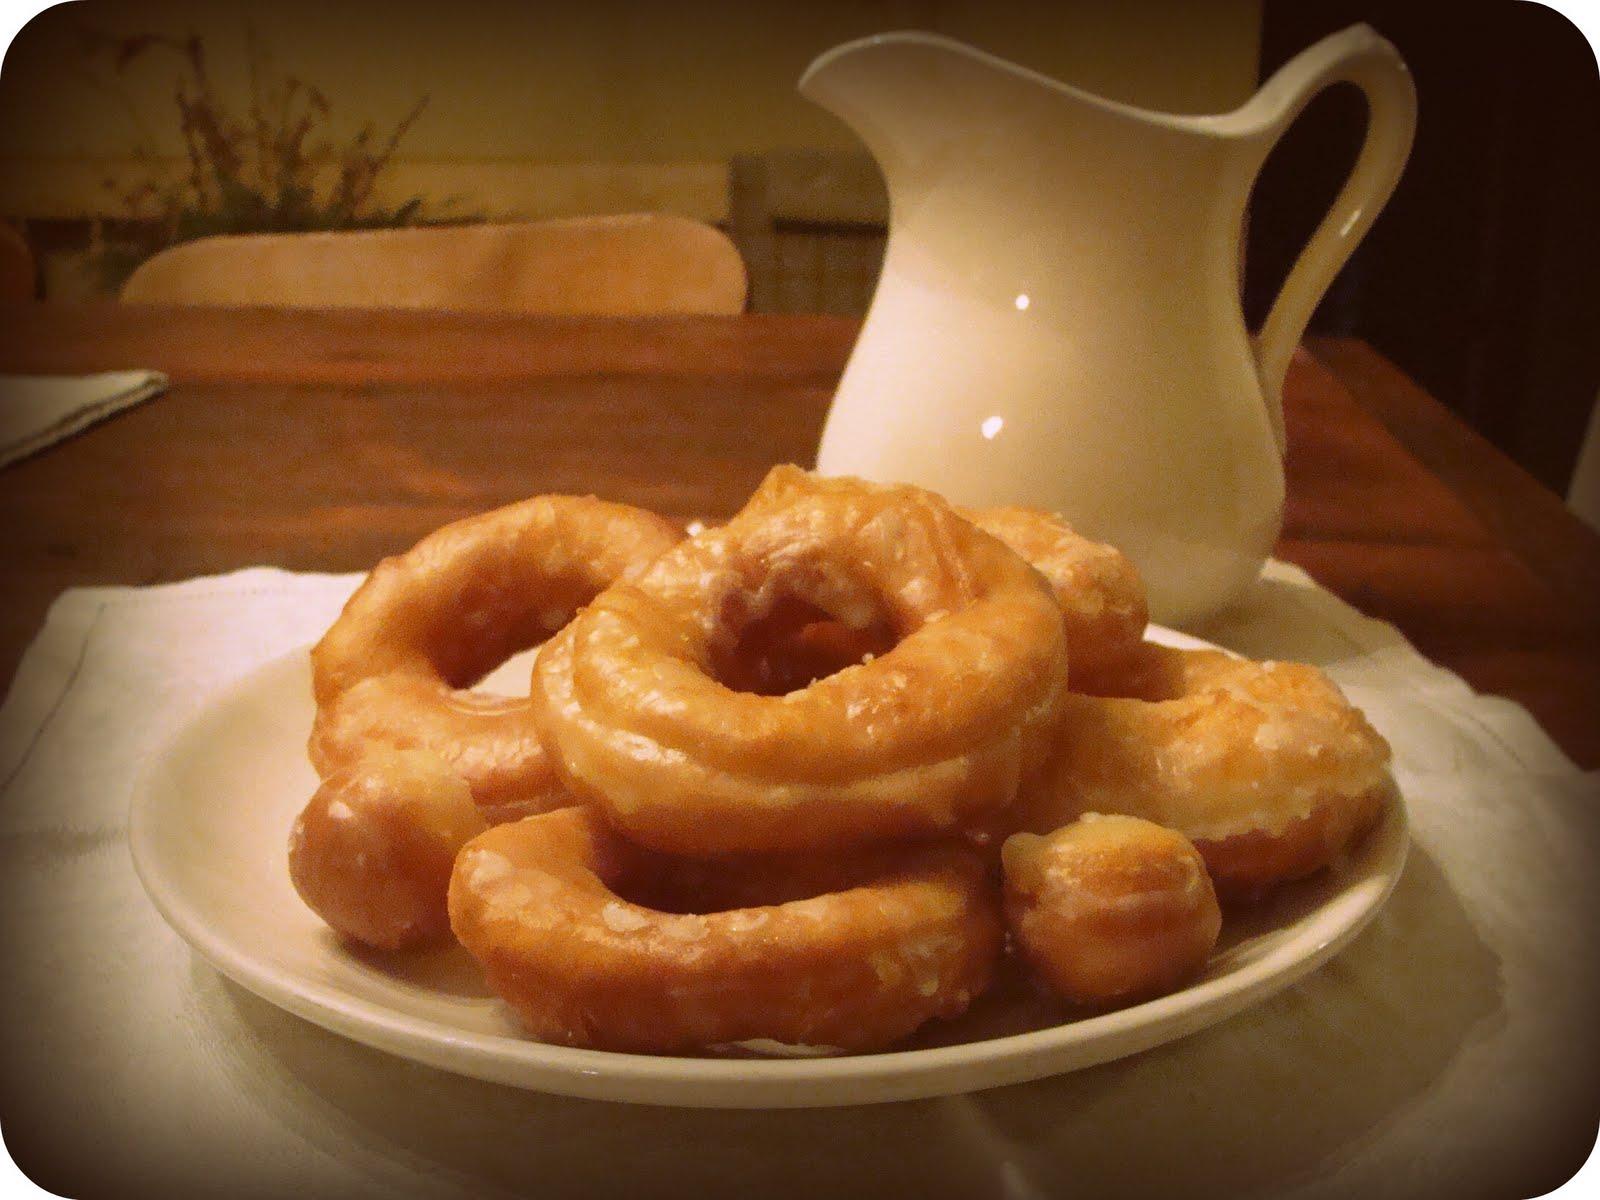 http://2.bp.blogspot.com/-RyxOAjV0dfw/TZVEe3Mr-lI/AAAAAAAAAUI/jLKLgSI9ESA/s1600/donuts.jpg